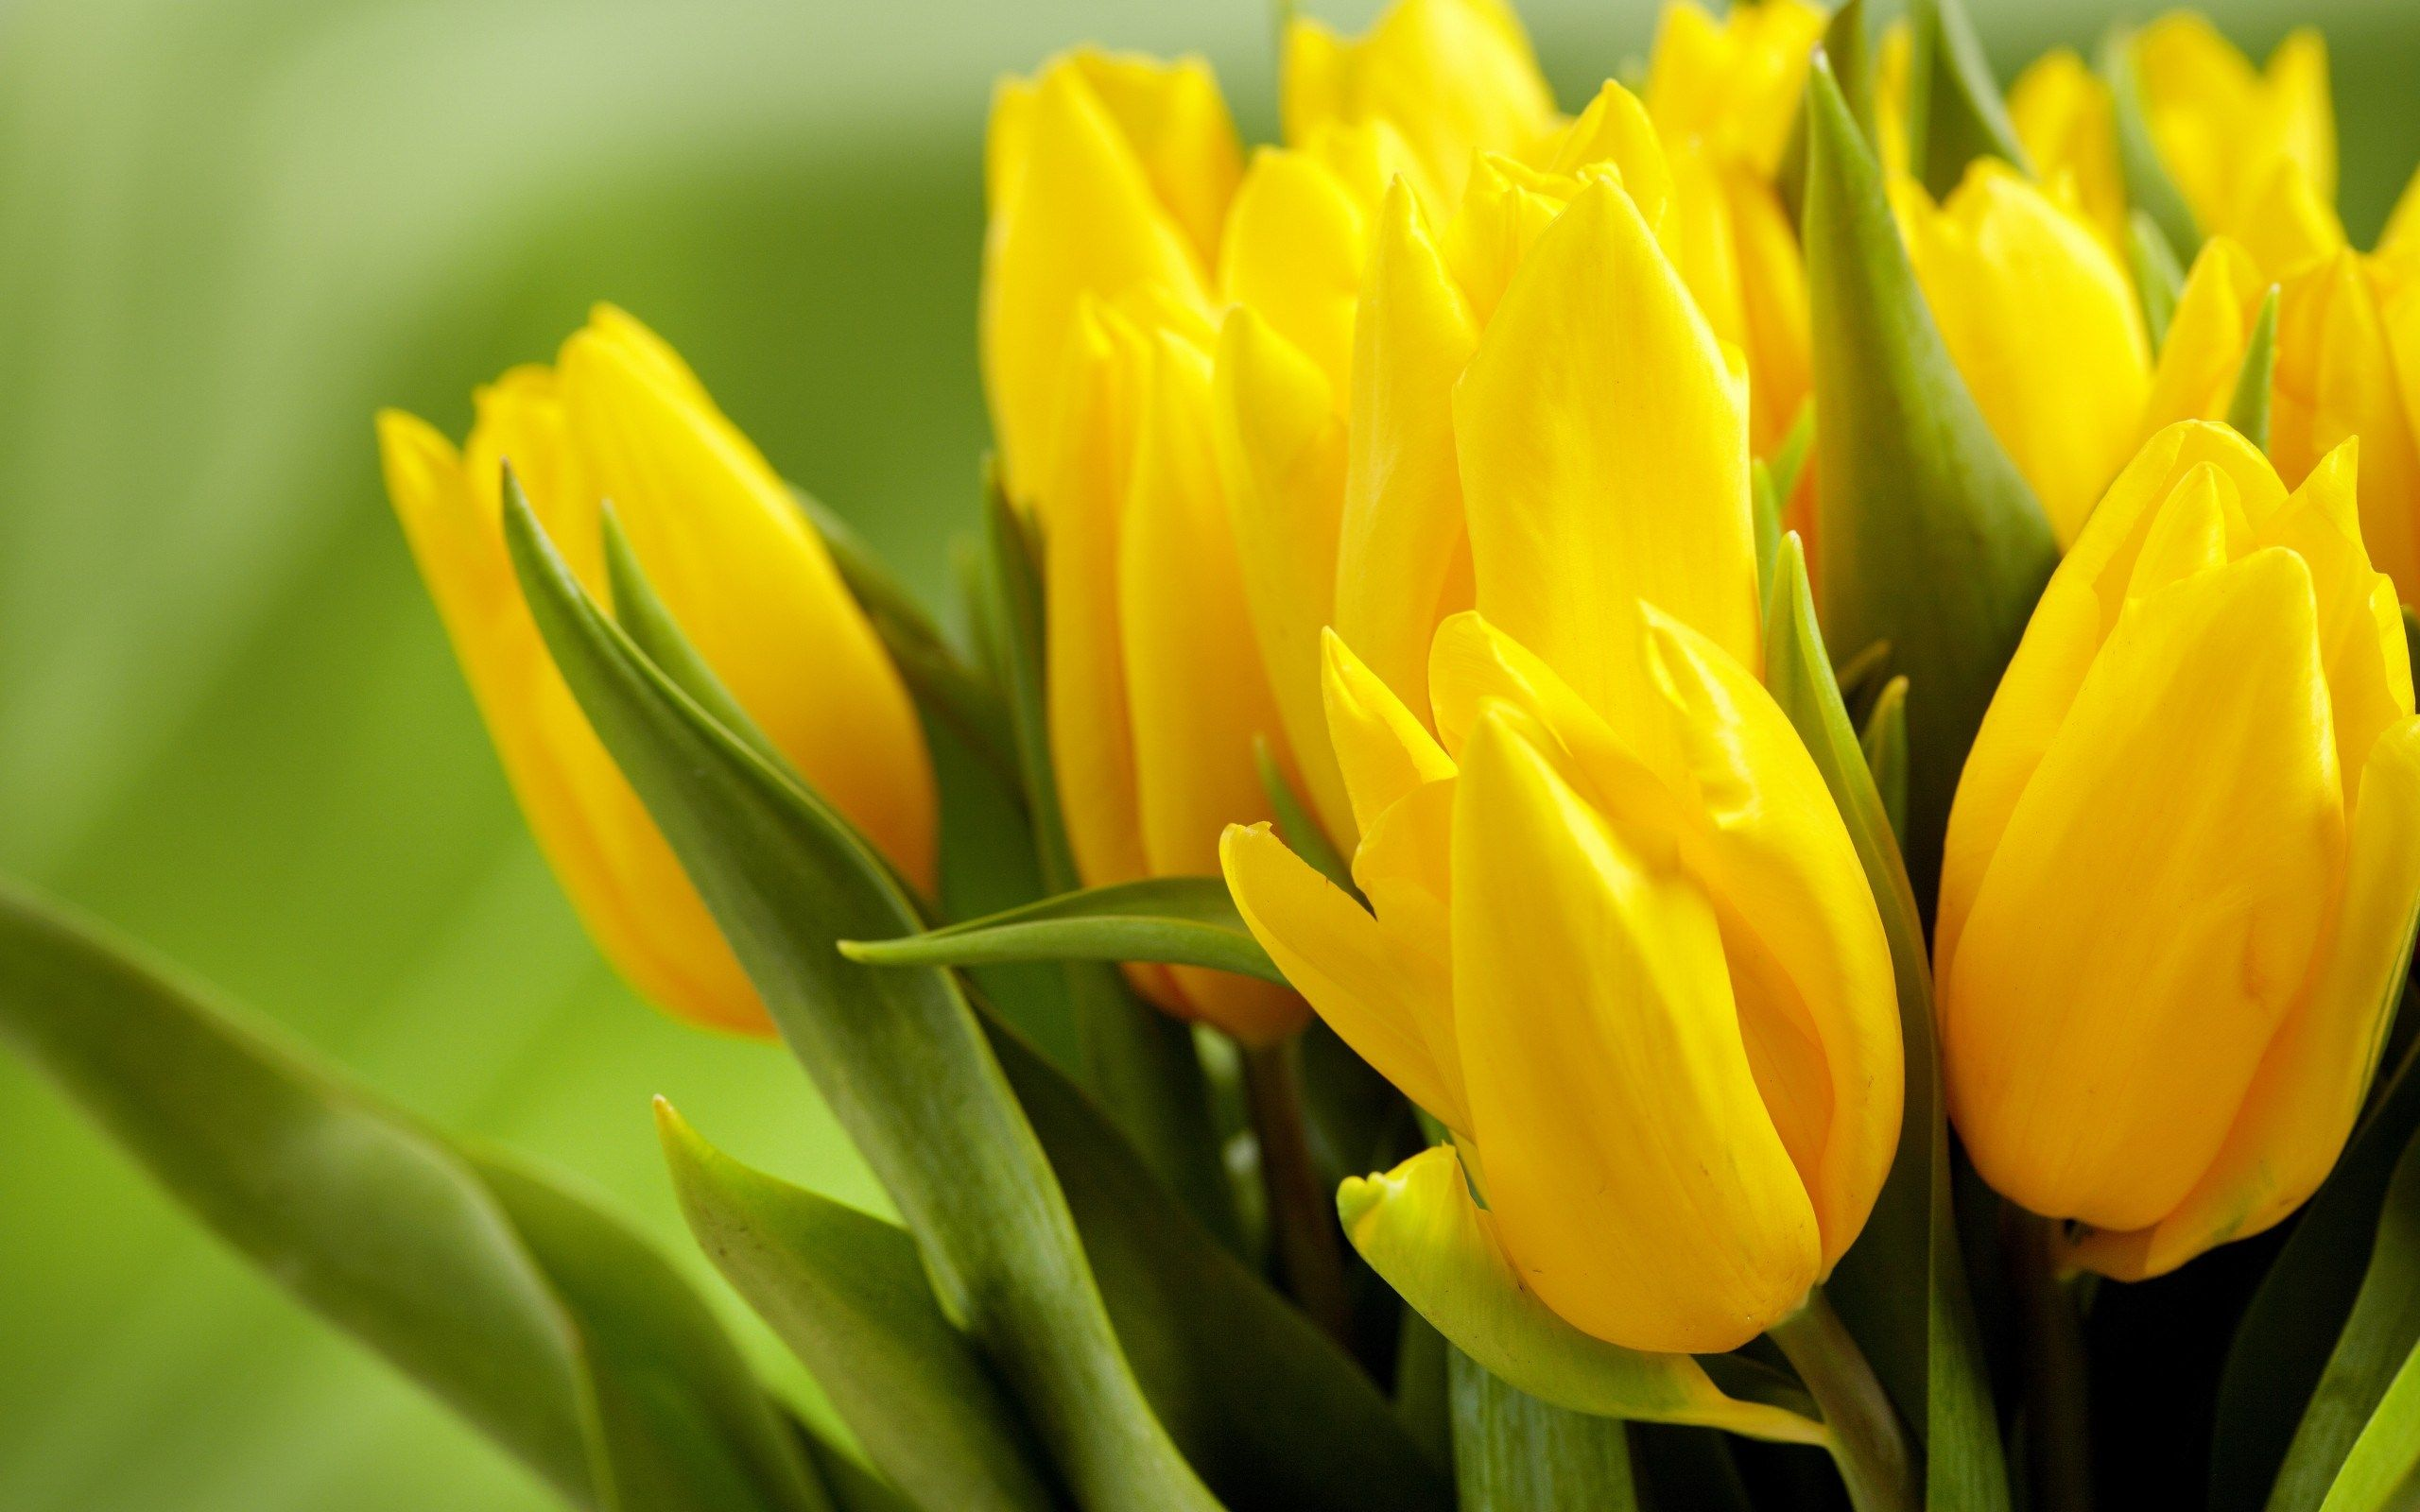 Yellow Flowers Hd Wallpaper 2560x1600 23763 Yellow Tulips Yellow Flower Wallpaper Yellow Flowers